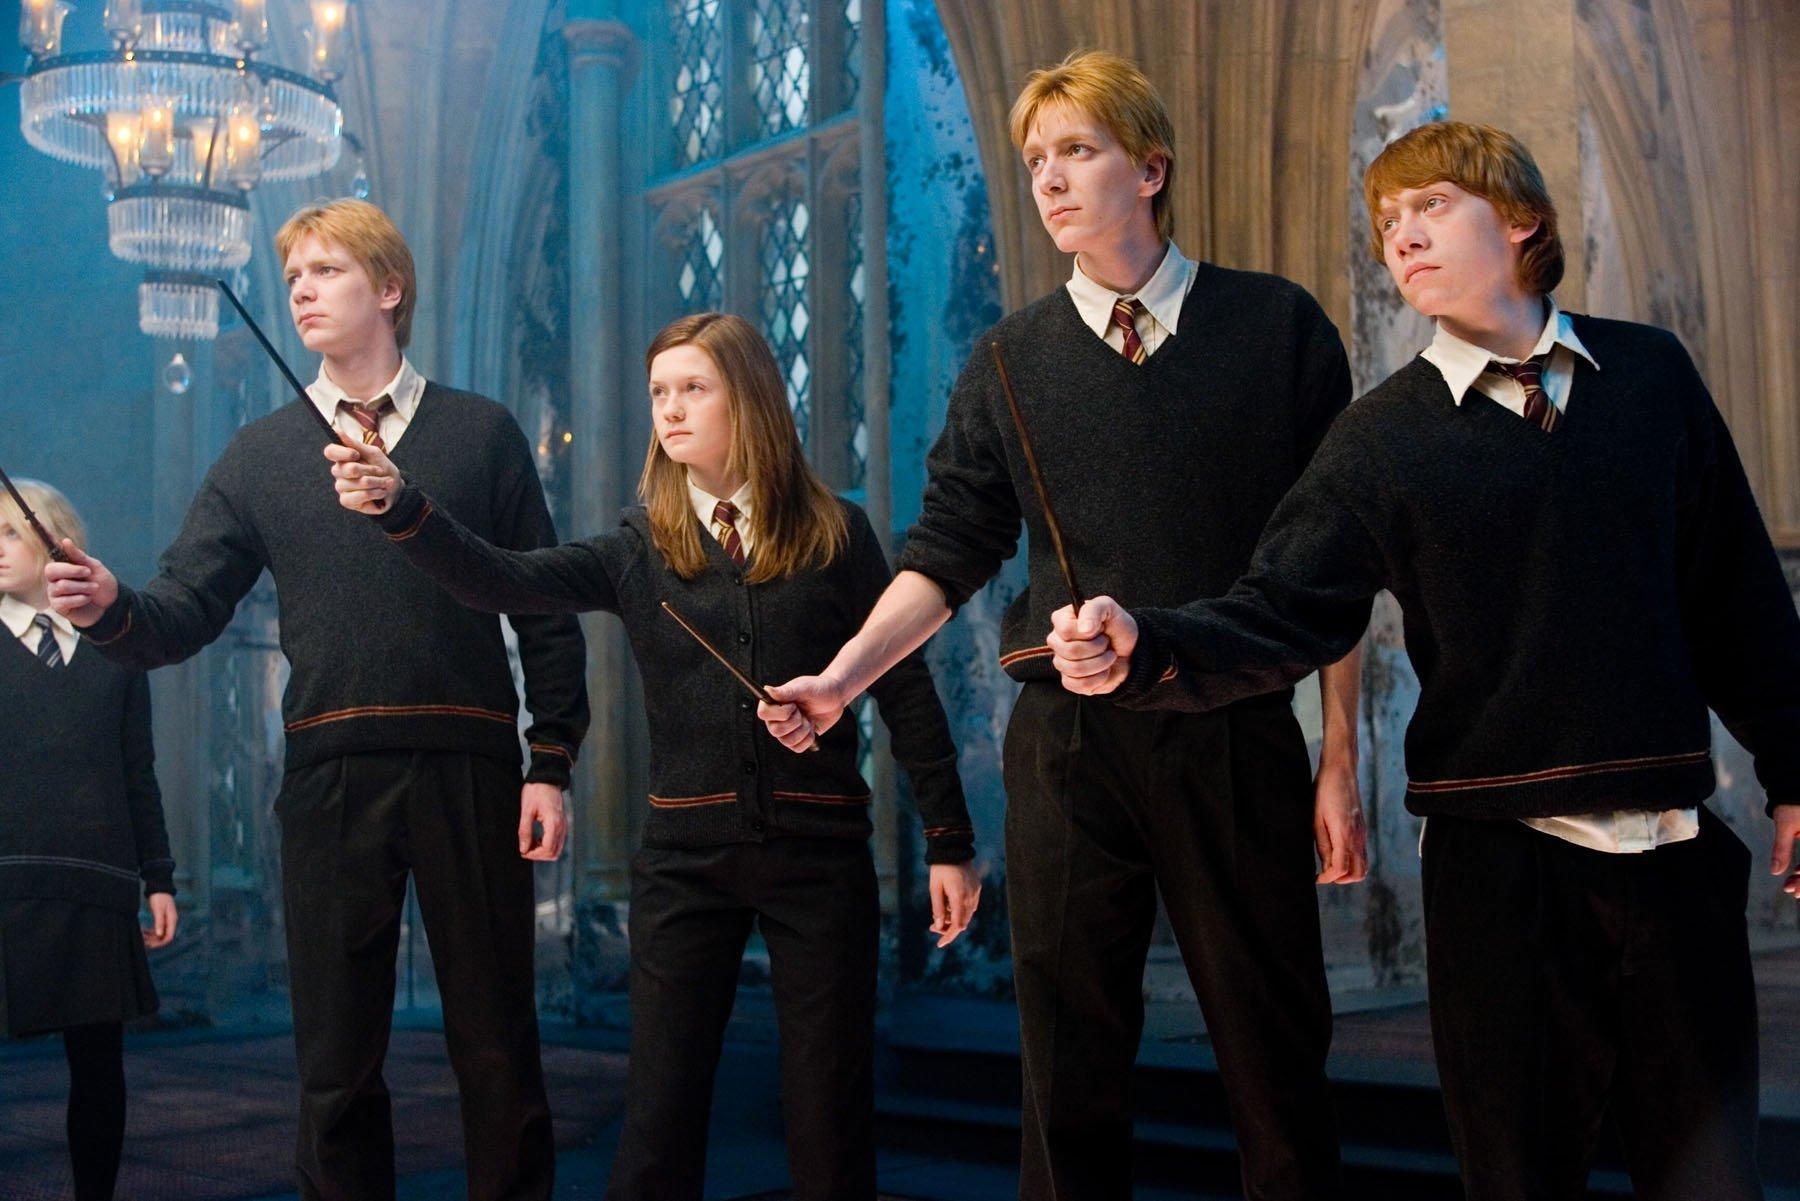 Jeu des images (version HP) - Page 6 Dumbledore-s-Army-harry-potter-world-2255111-1800-1201